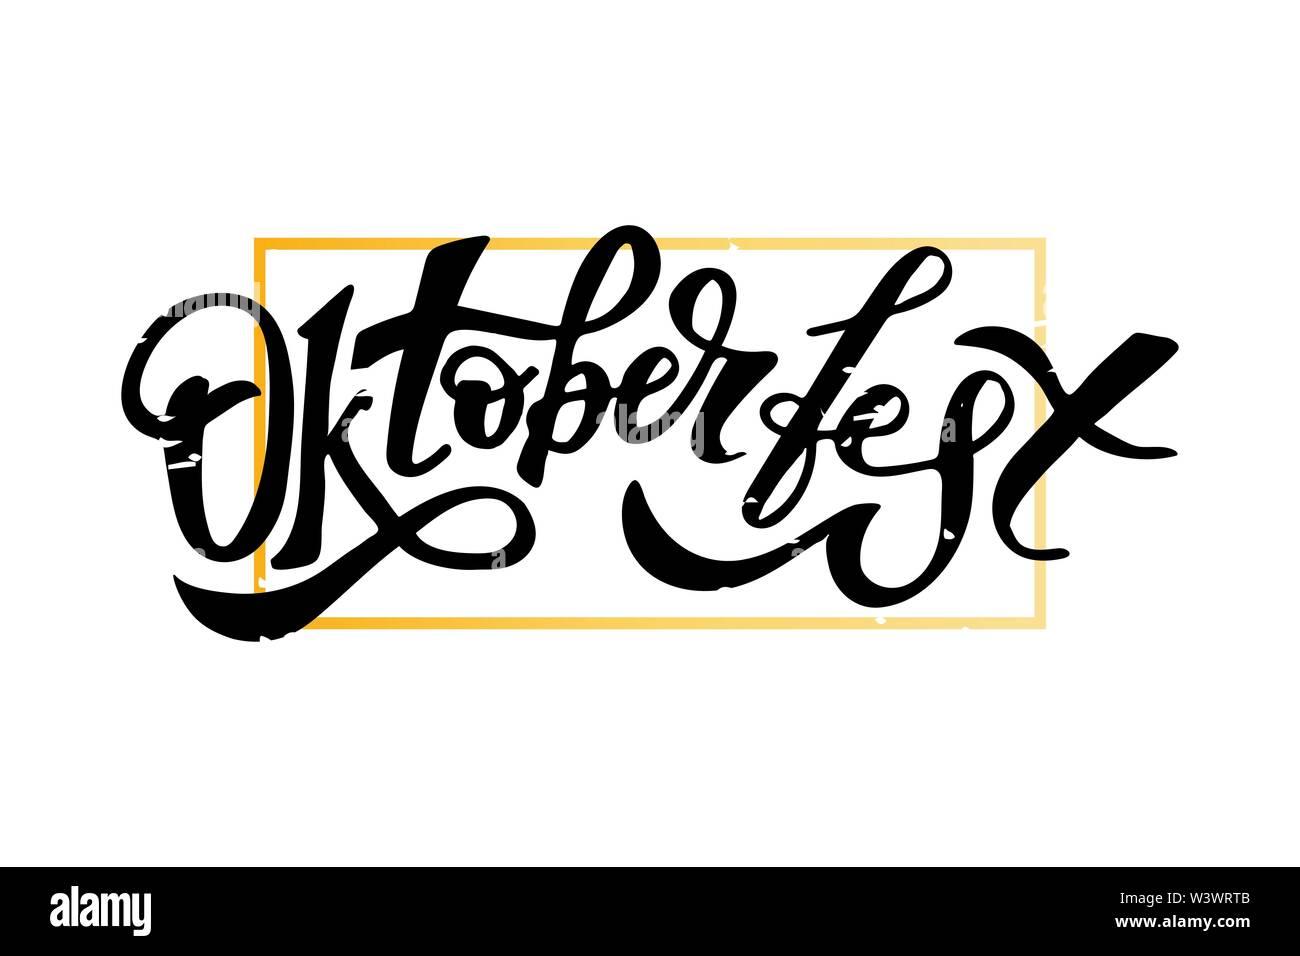 Oktoberfest lettering Calligraphy Brush Text Holiday Illustration - Stock Image